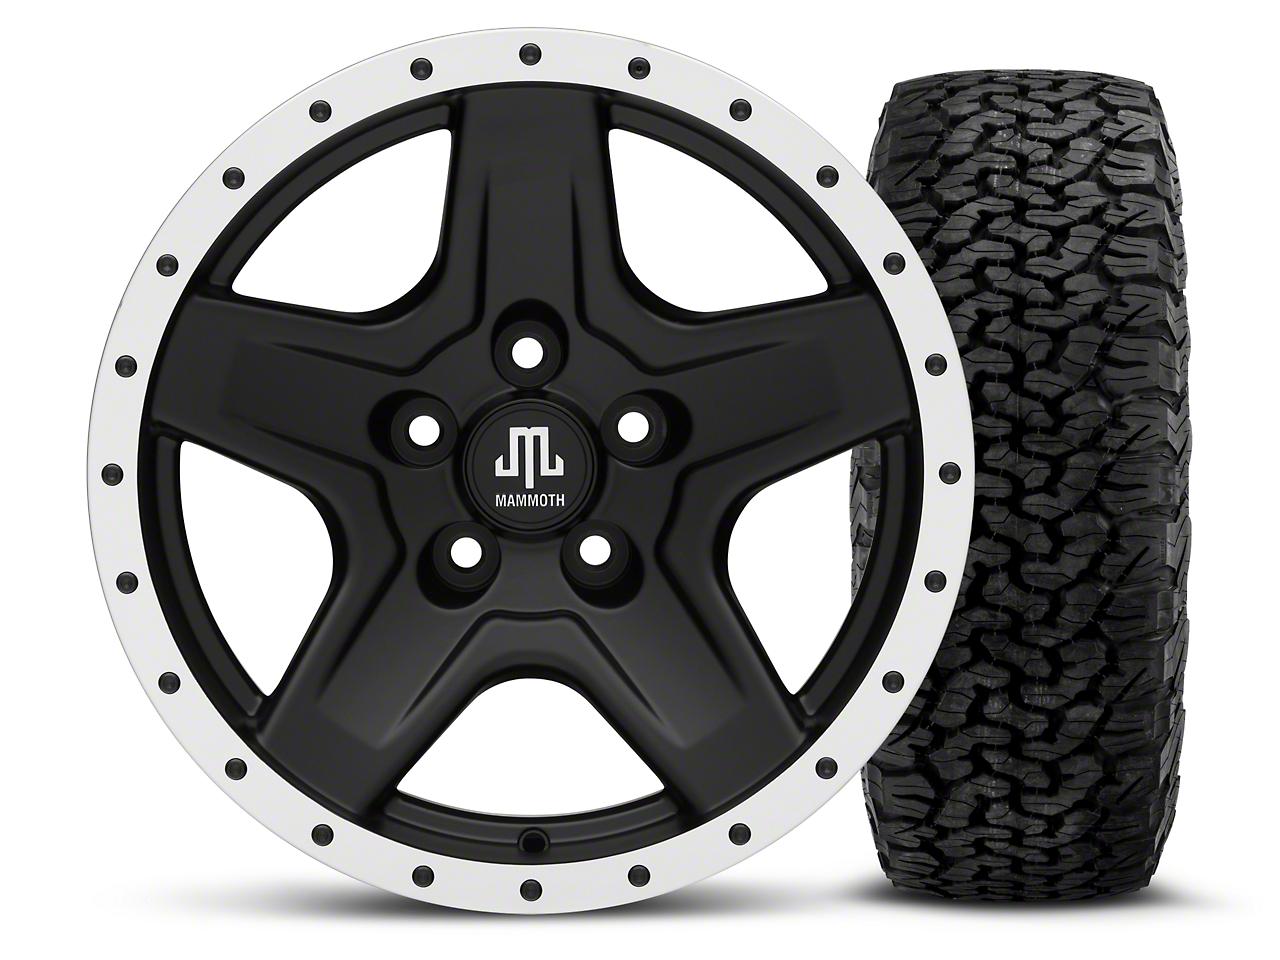 Mammoth Boulder Beadlock Style Black 16x8 Wheel & BF Goodrich All Terrain TA KO2 305/70R16 Tire Kit (87-06 Jeep Wrangler YJ & TJ)